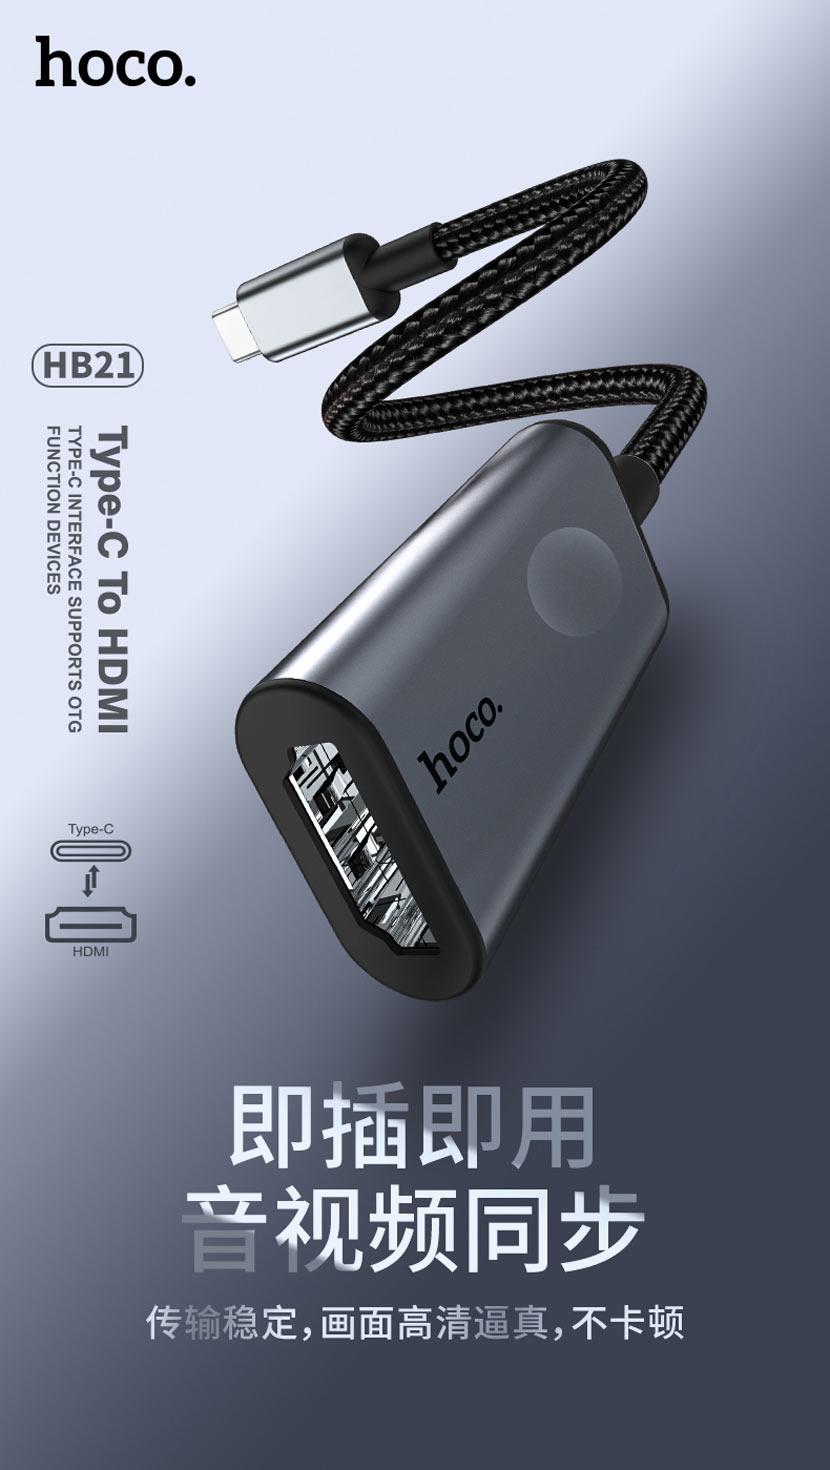 hoco news hb21 type c to hdmi converter cn